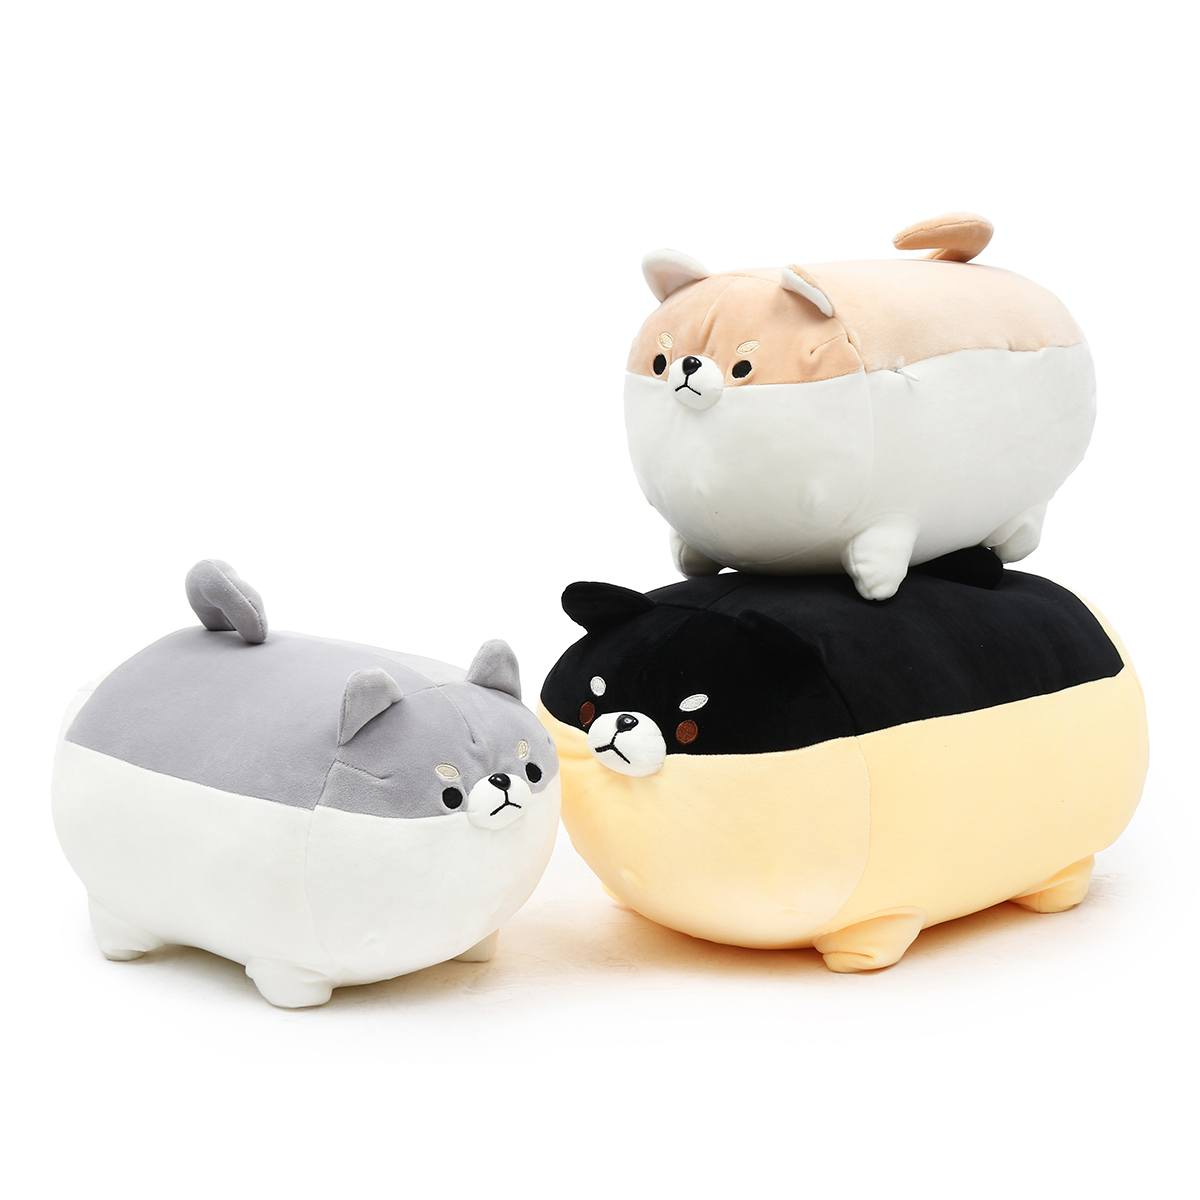 40/50cm Cute Shiba Inu Dog Plush Toy Stuffed Soft Animal Corgi Chai Pillow Christmas Gift for Kids Kawaii Valentine Present